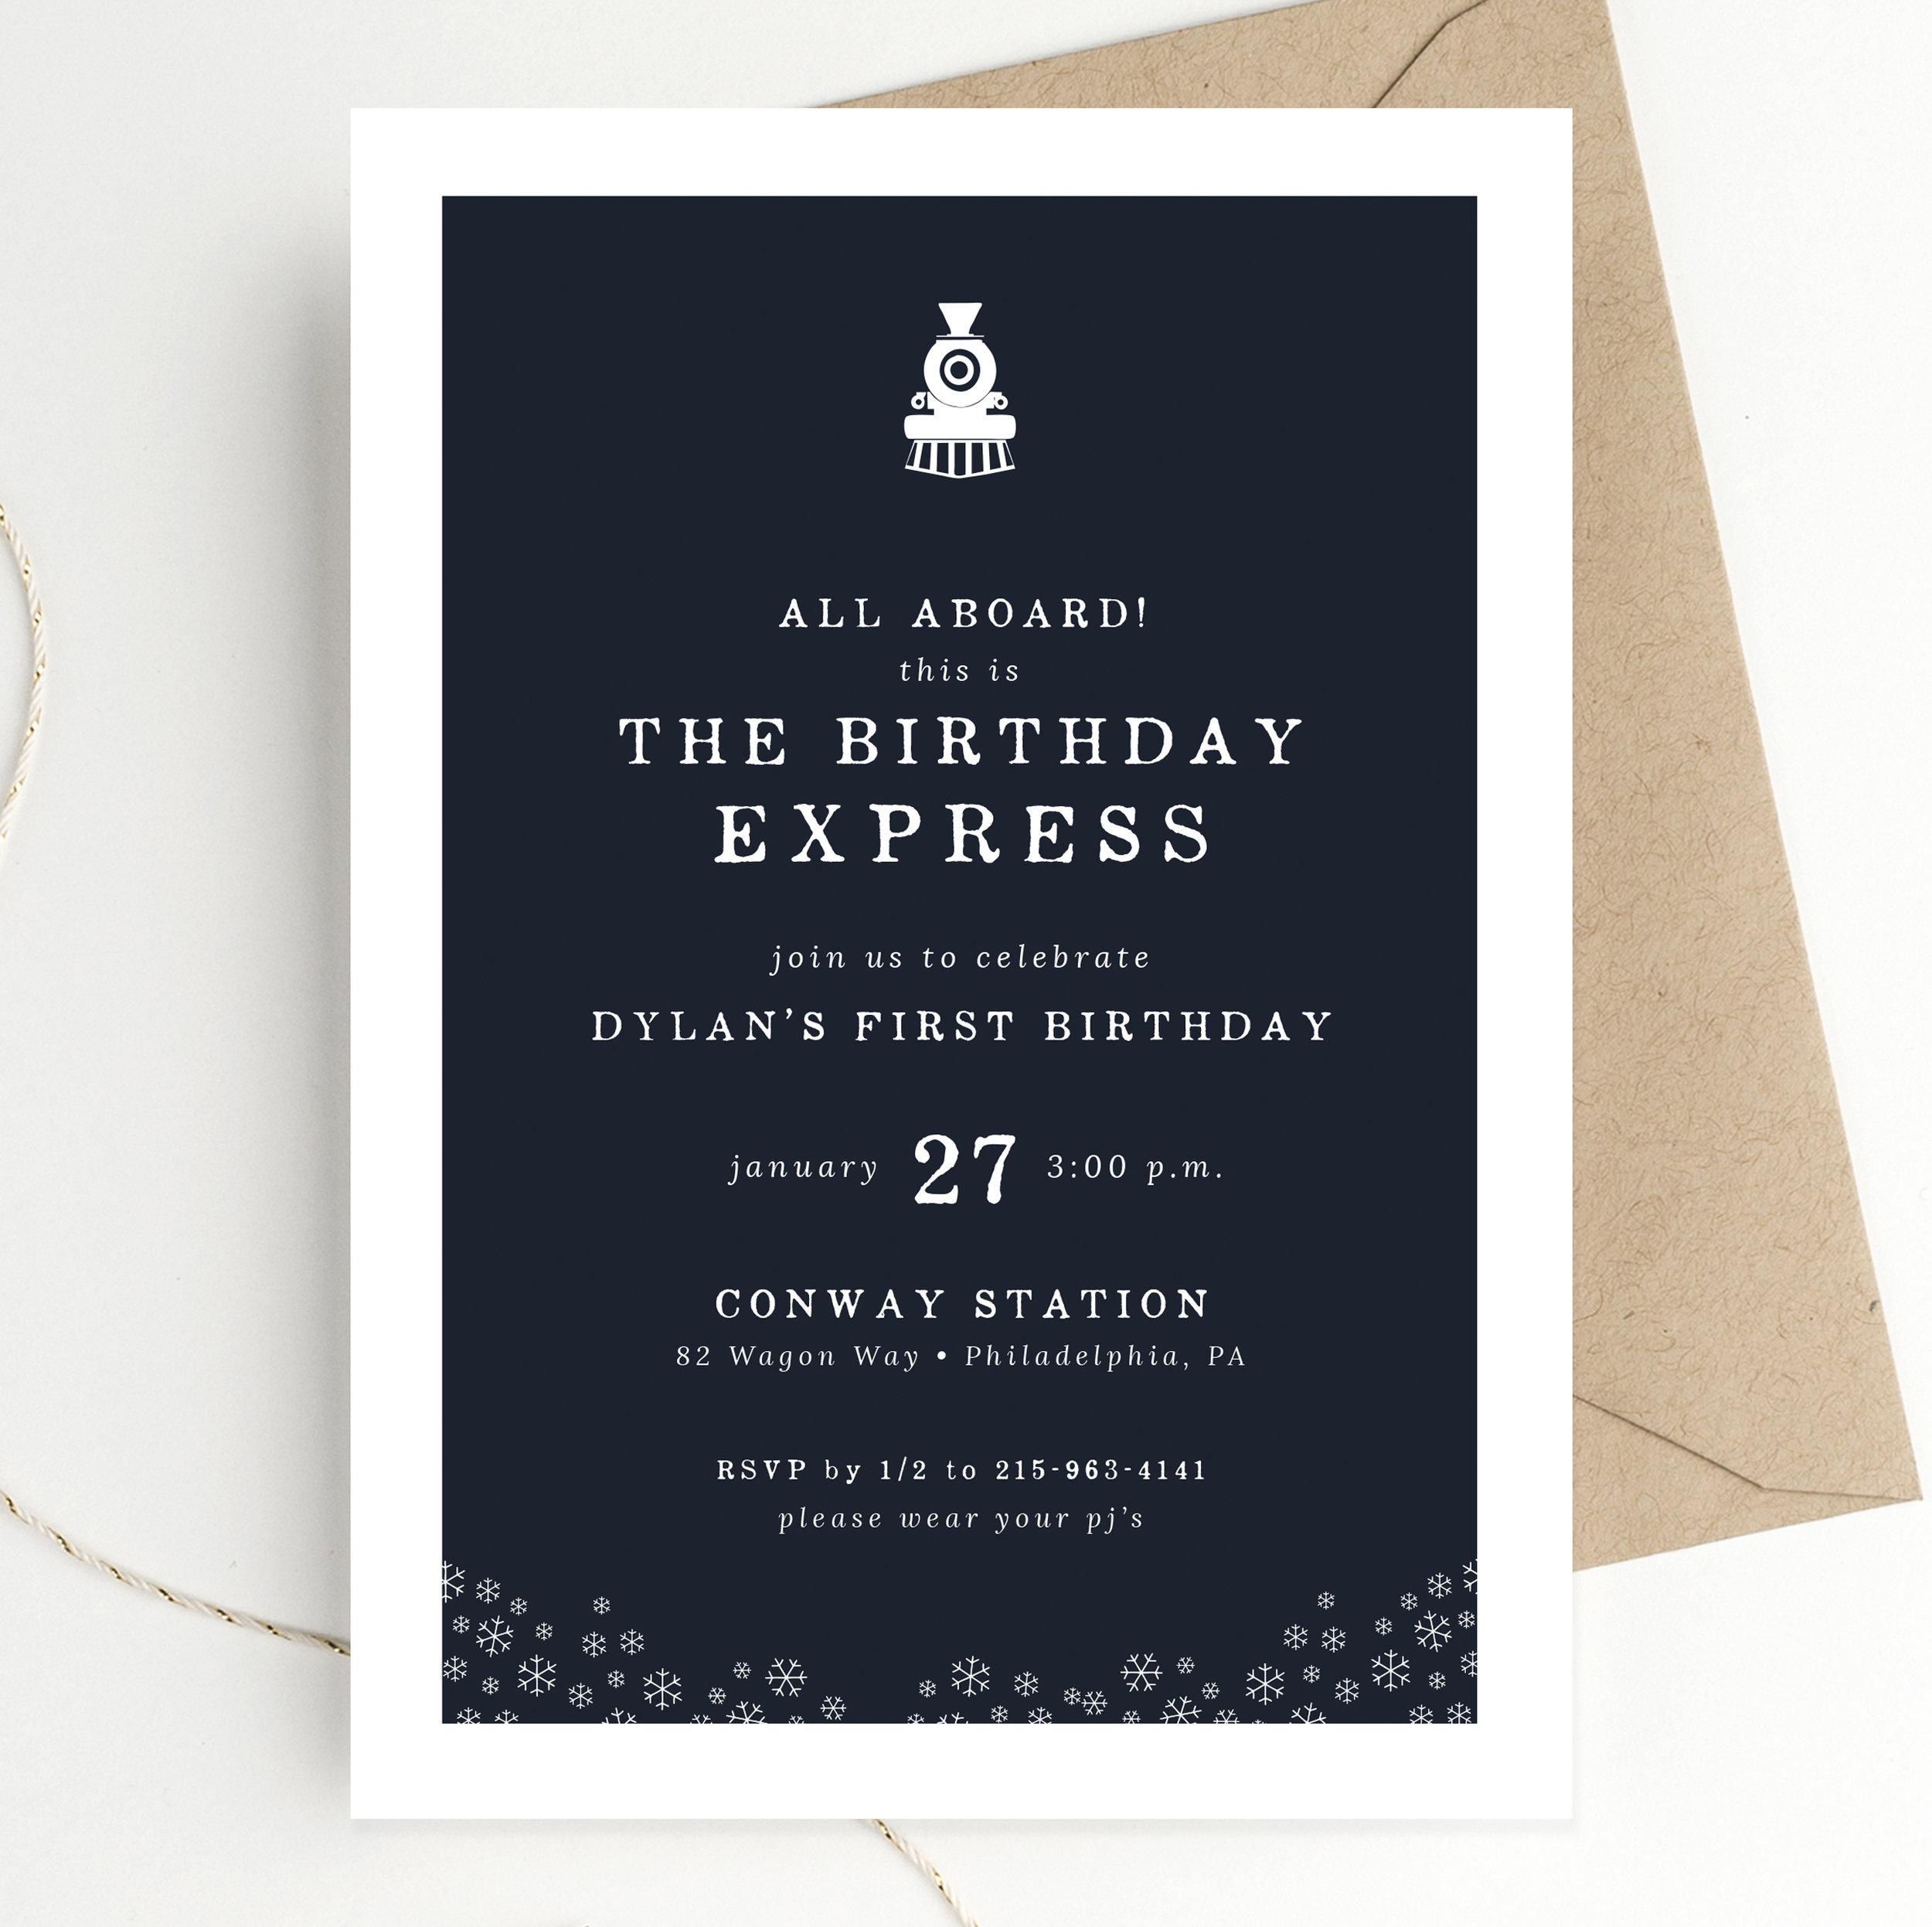 birthdayexpress.jpg